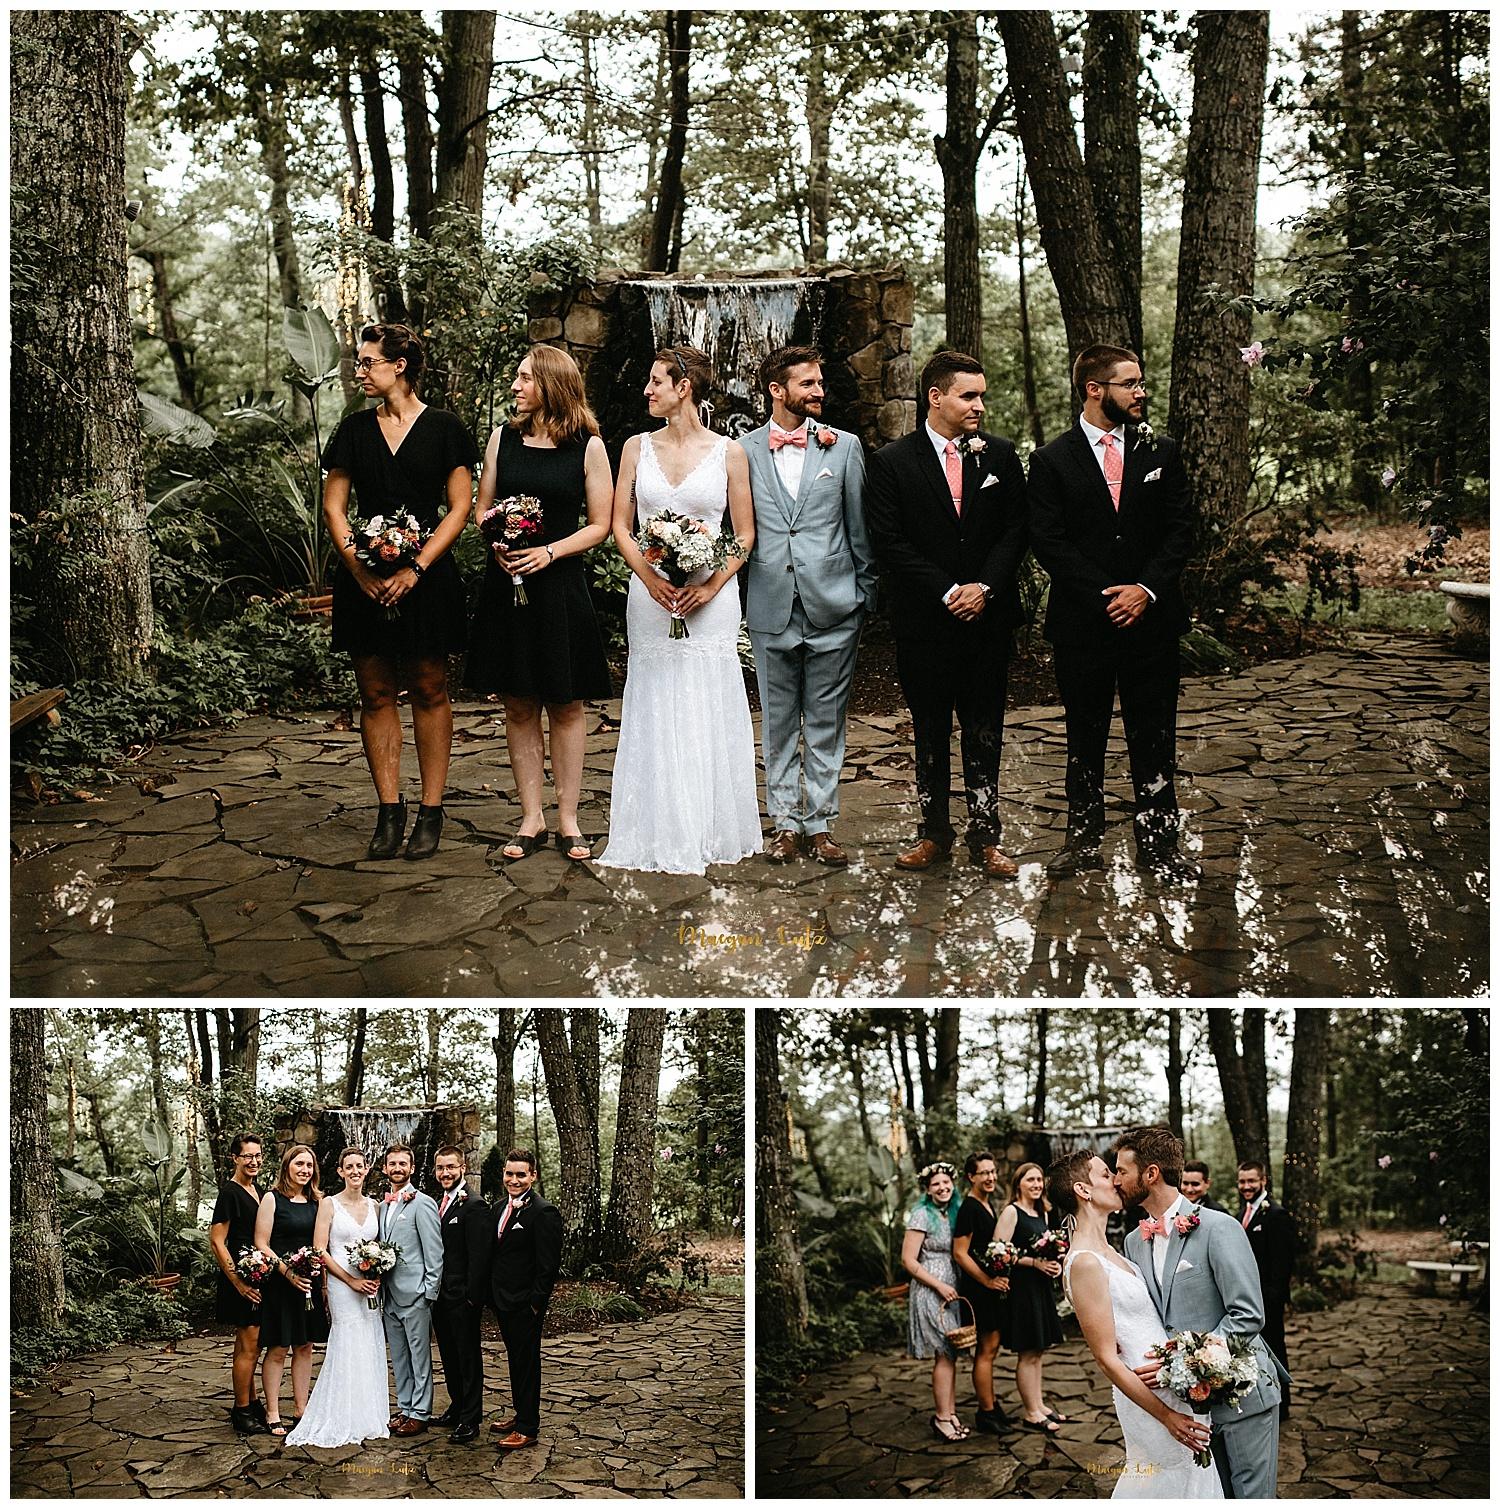 NEPA-Wedding-Photographer-at-Carmens-Country-Inn-and-Gardens-Drums-PA_0017.jpg